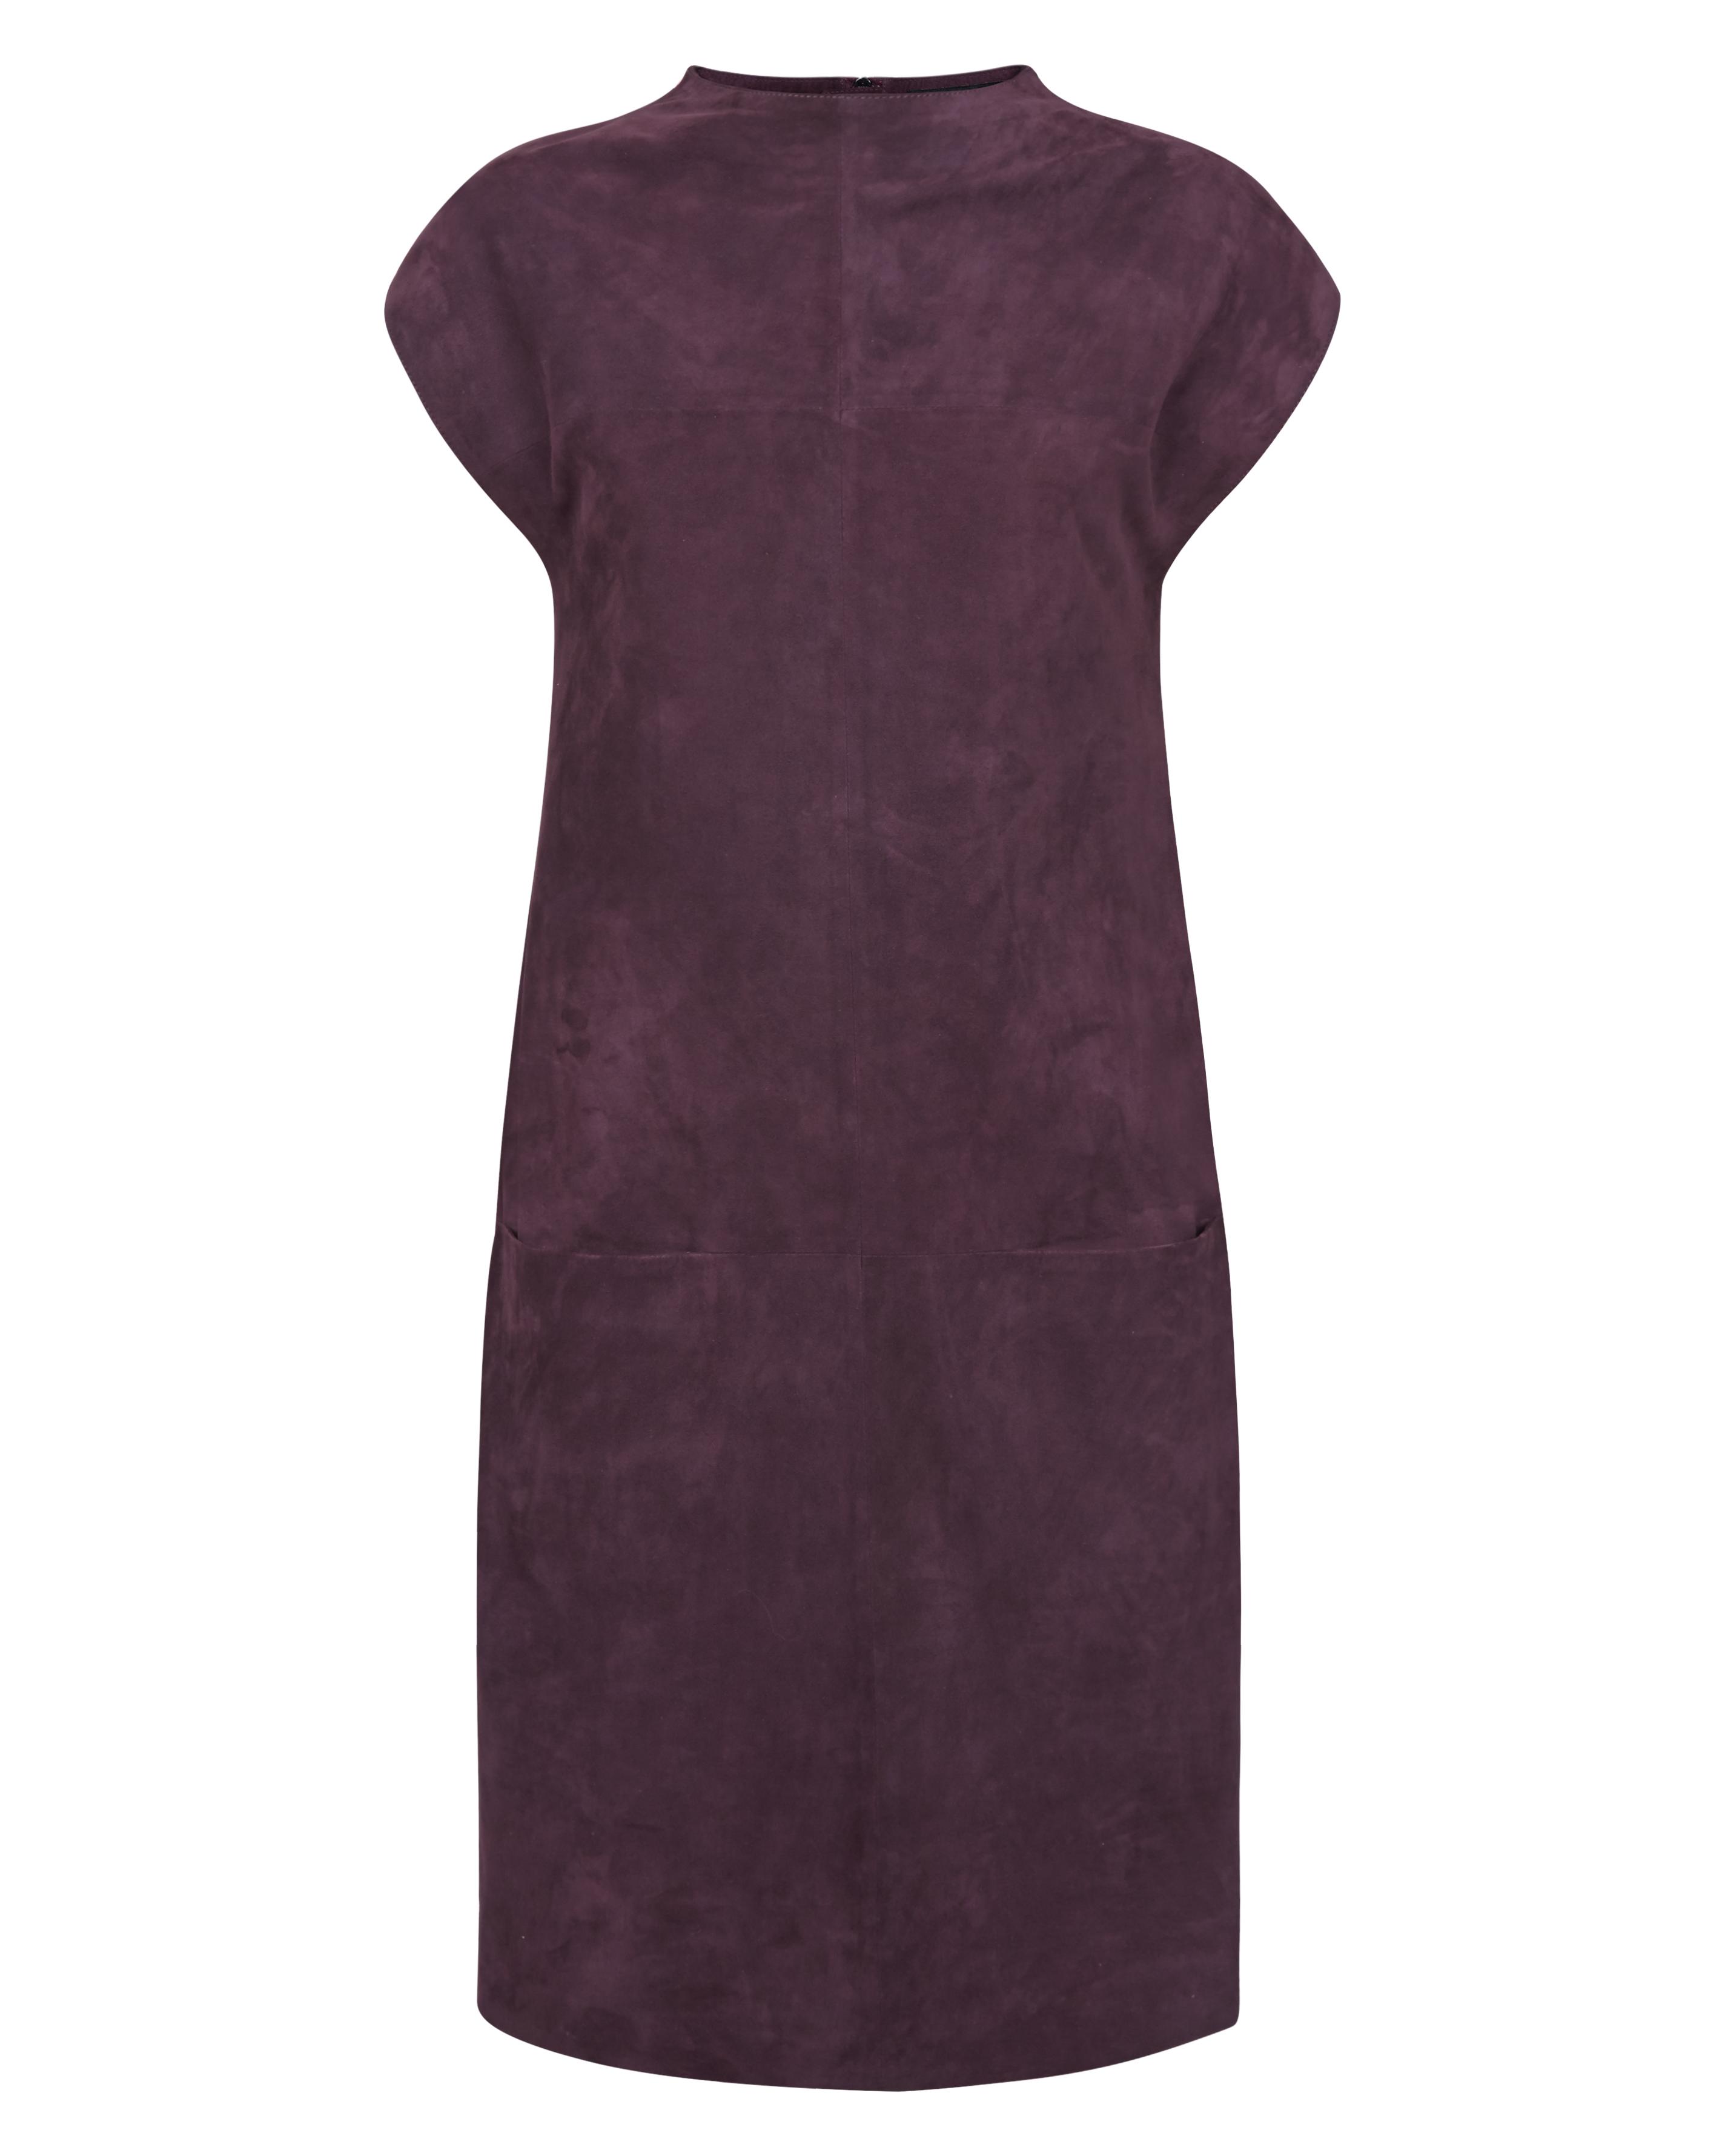 jaeger_suede dress